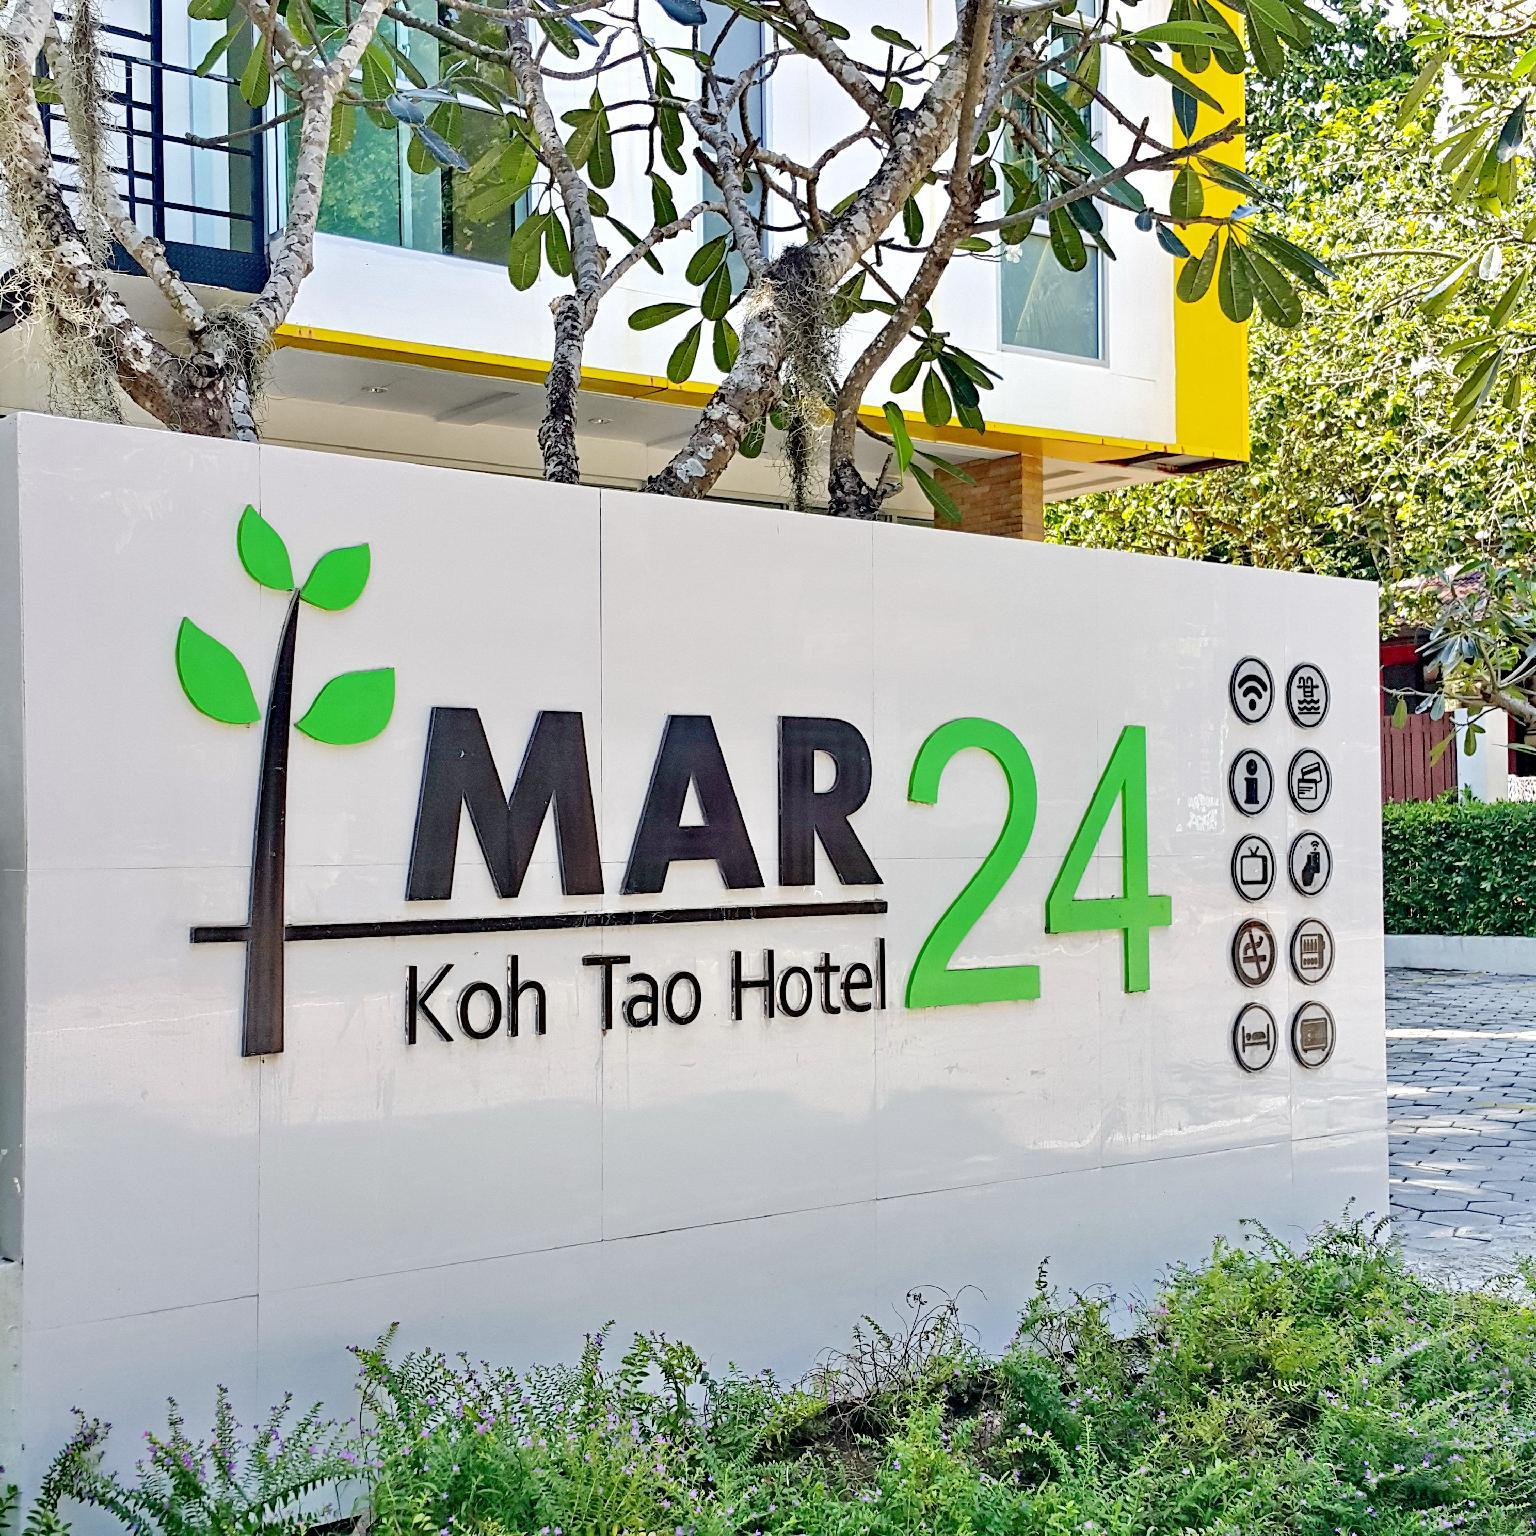 Mar24 Koh Tao Hotel